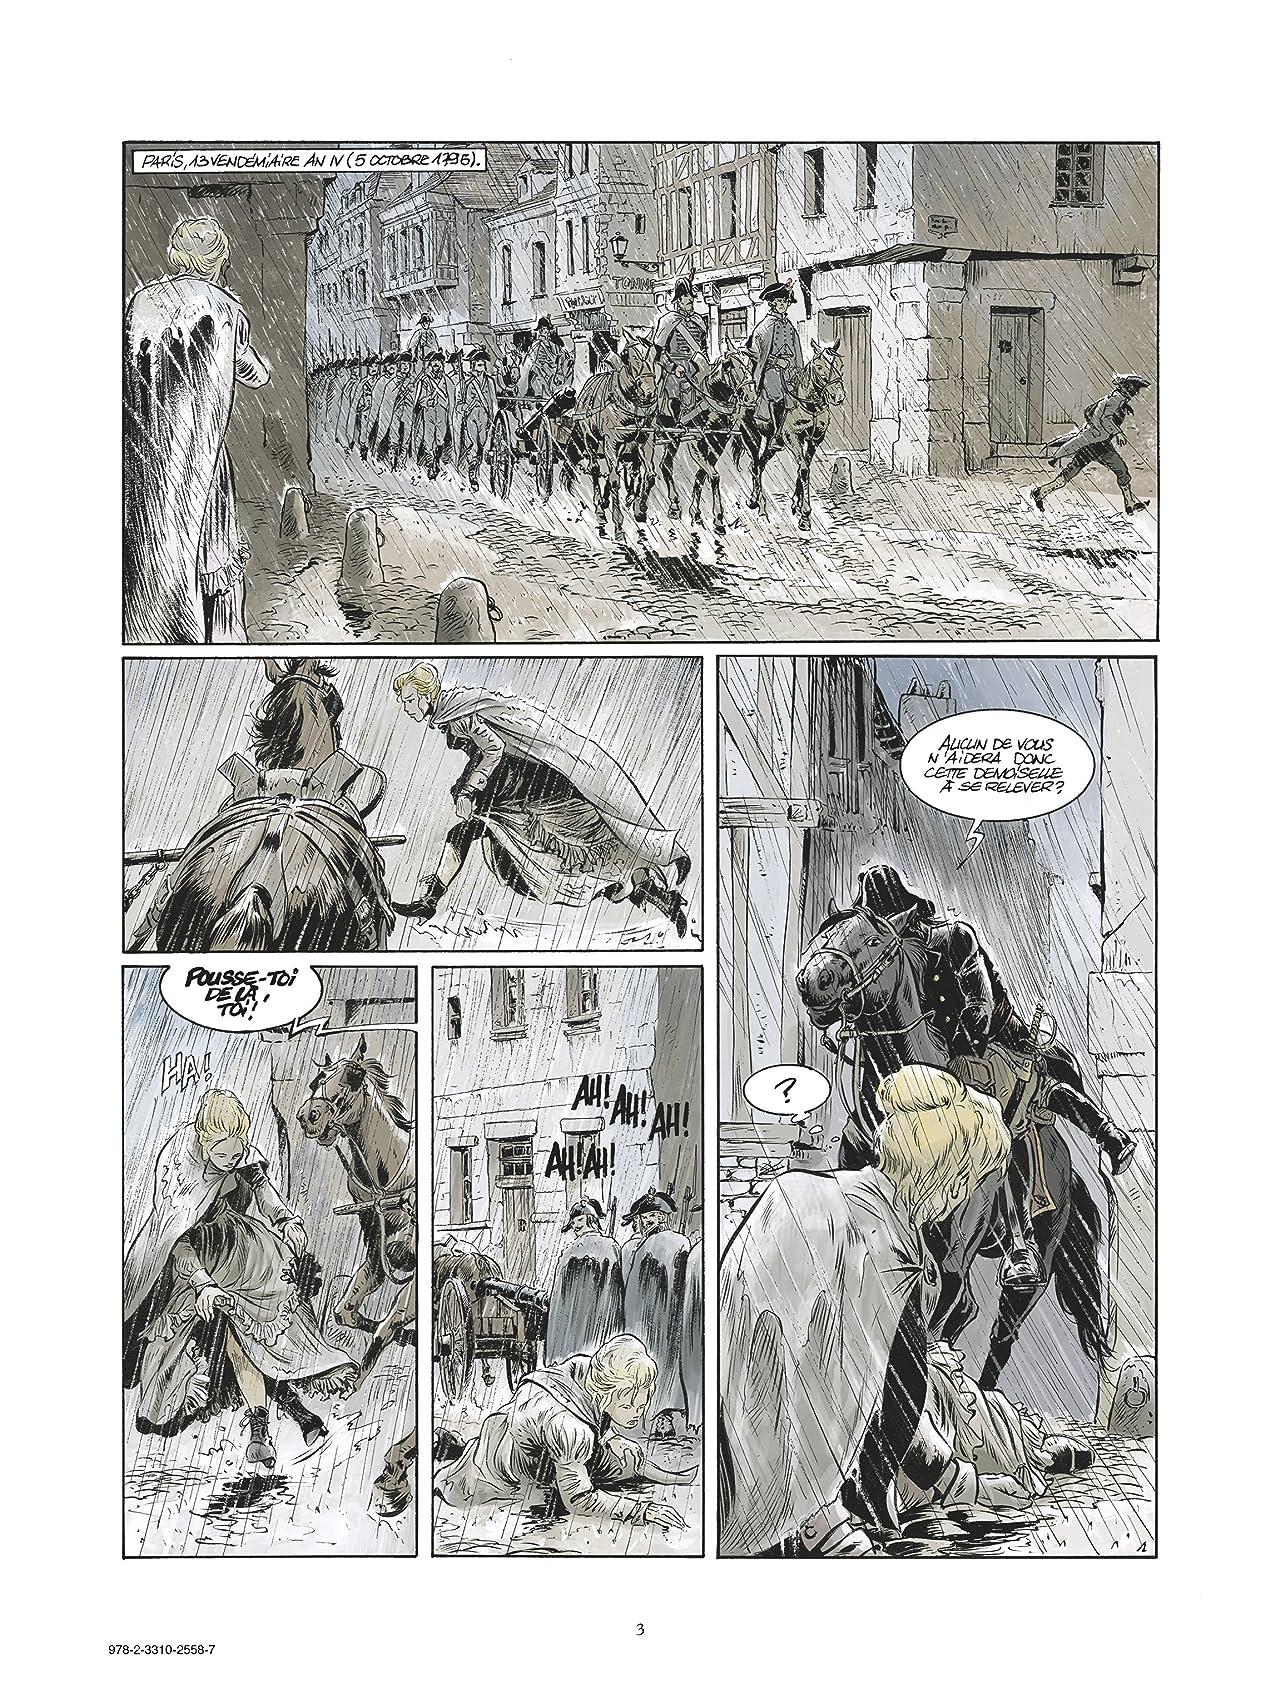 Les pirates de Barataria Vol. 10: Galveston